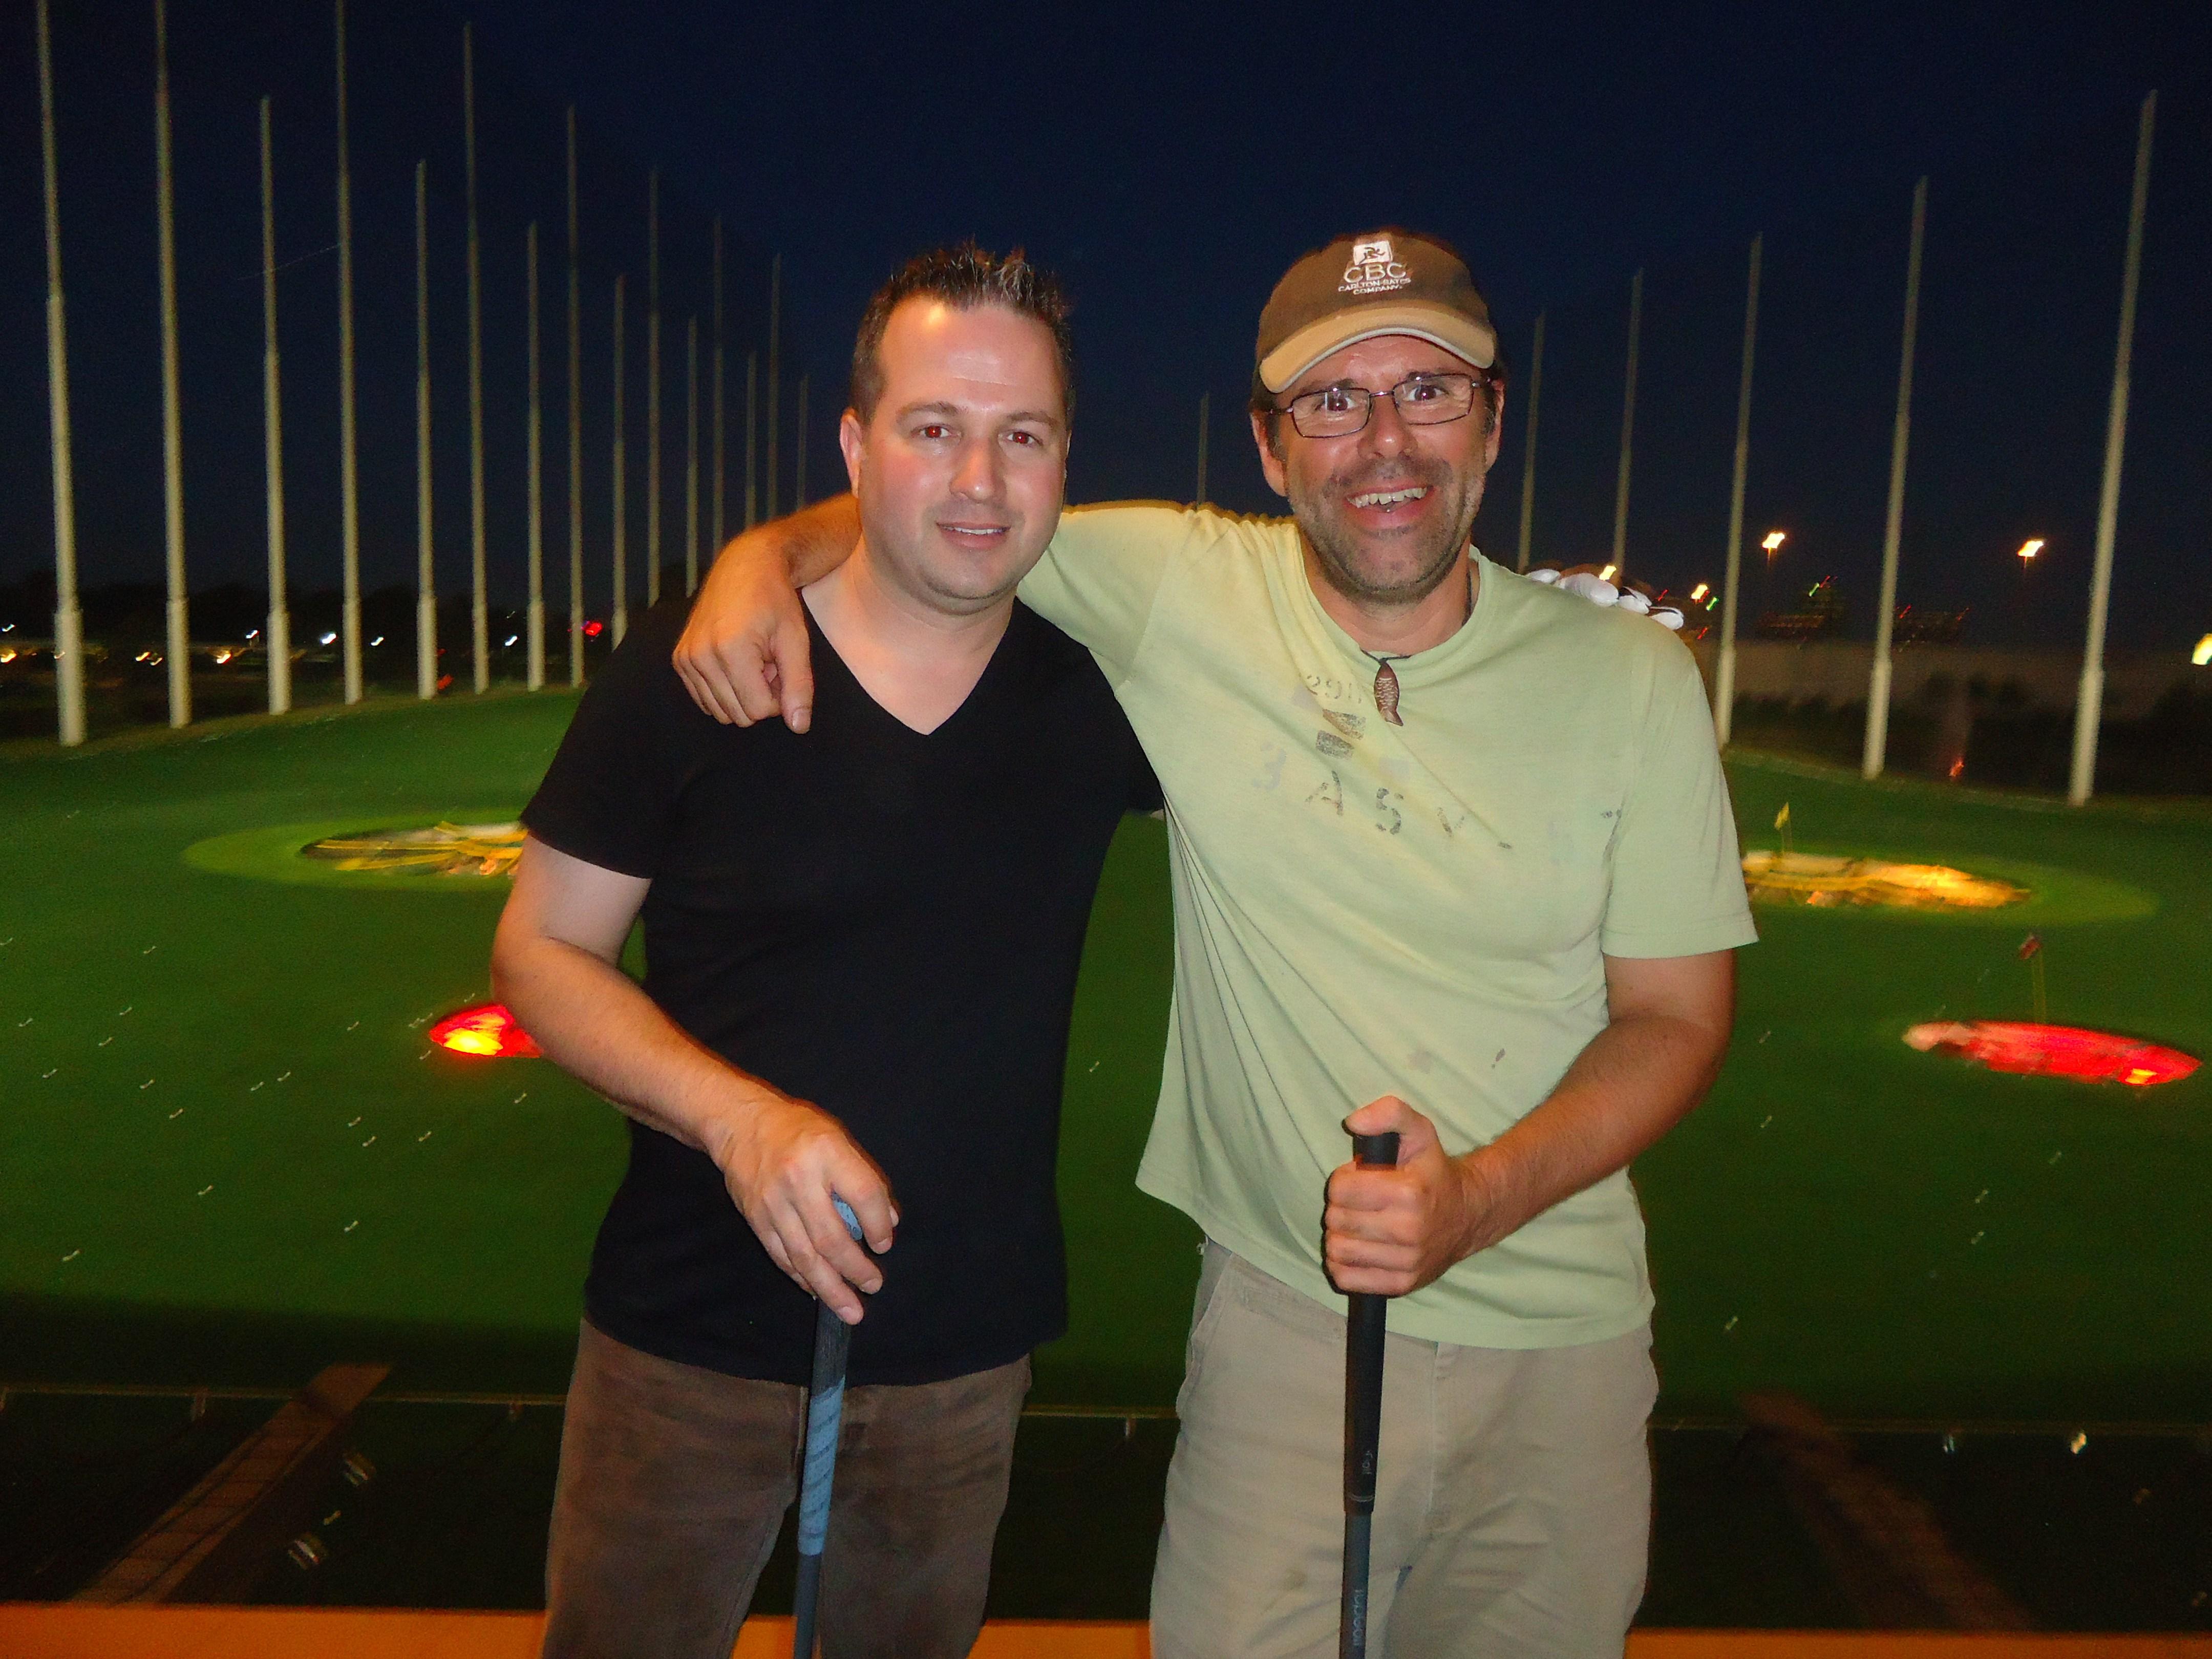 Brad & Ian - golfing buddies!